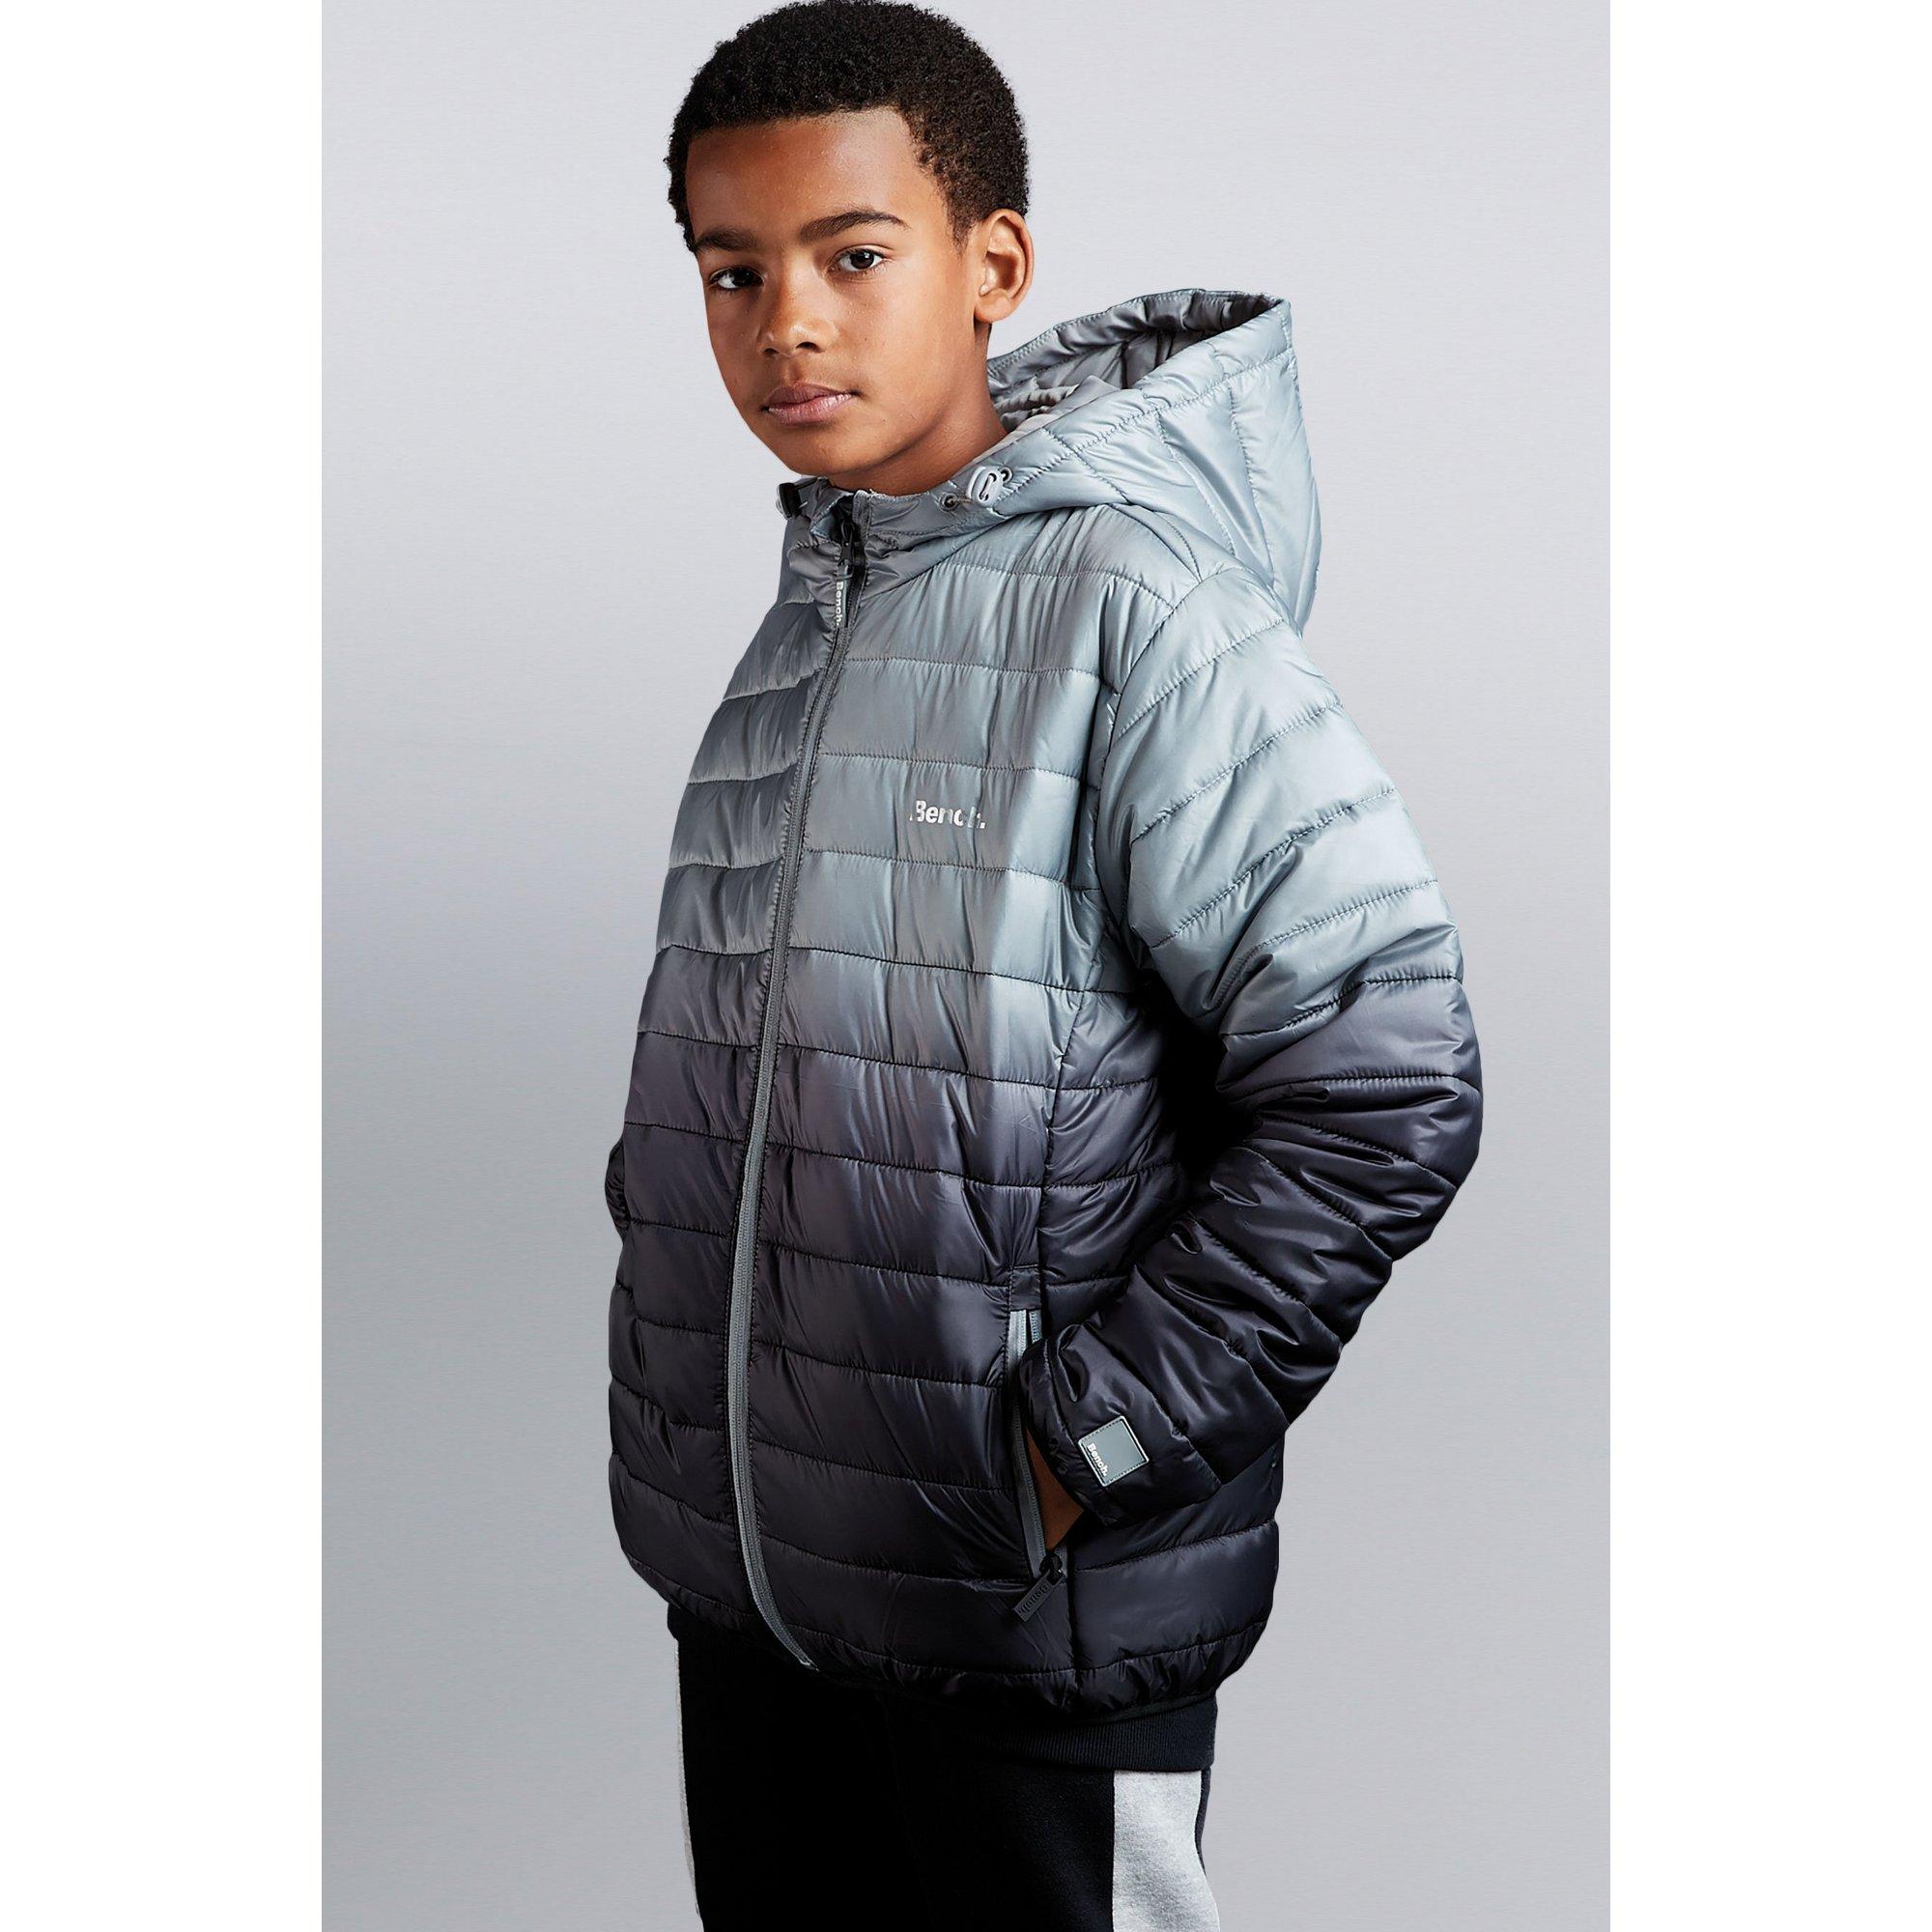 Image of Boys Bench Gradient Jacket